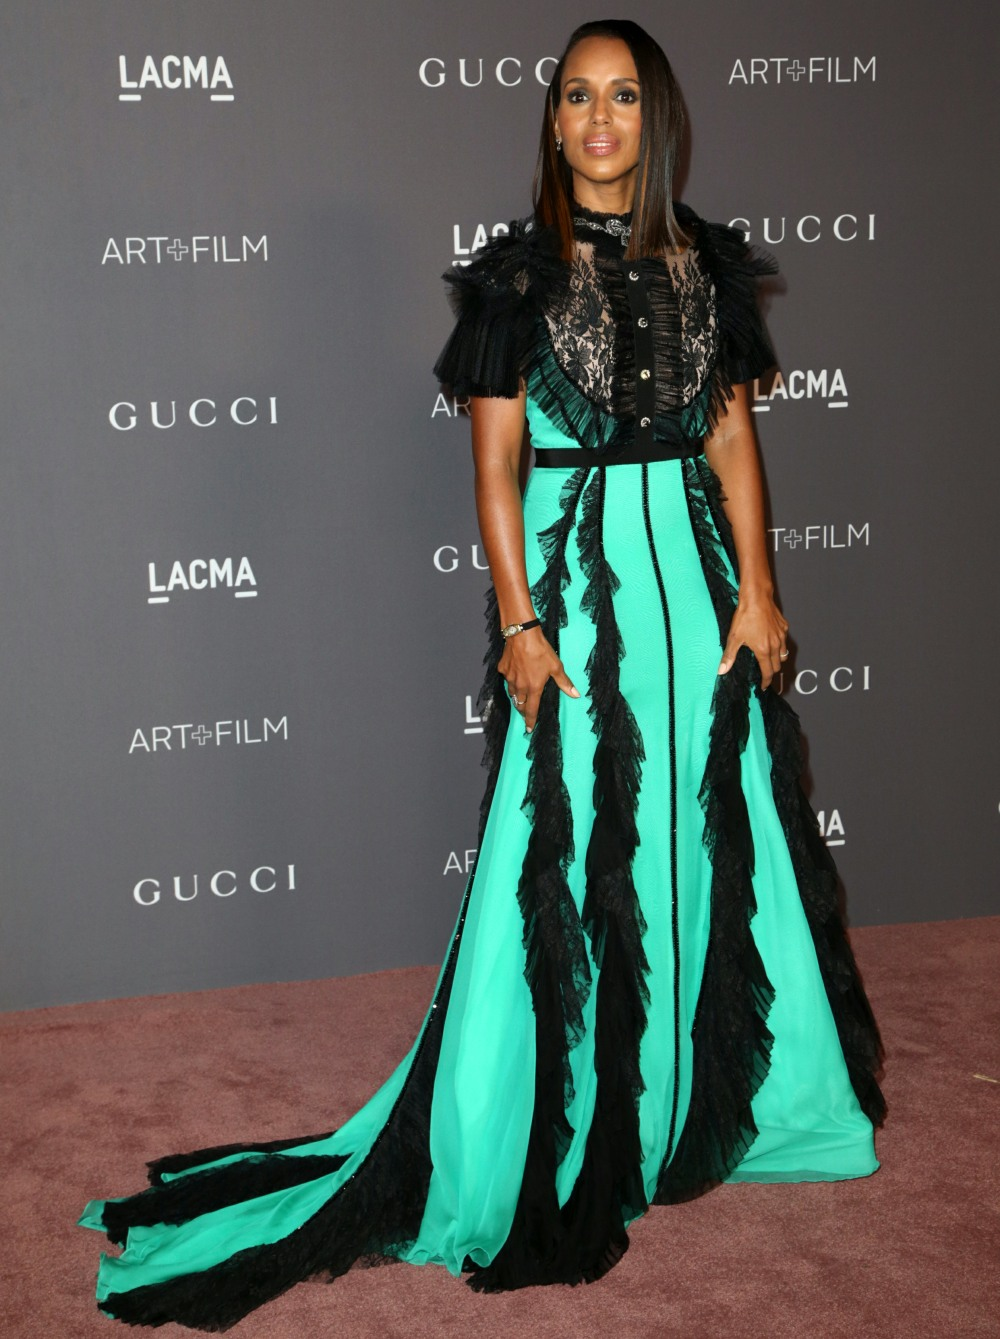 2017 LACMA Art and Film Gala